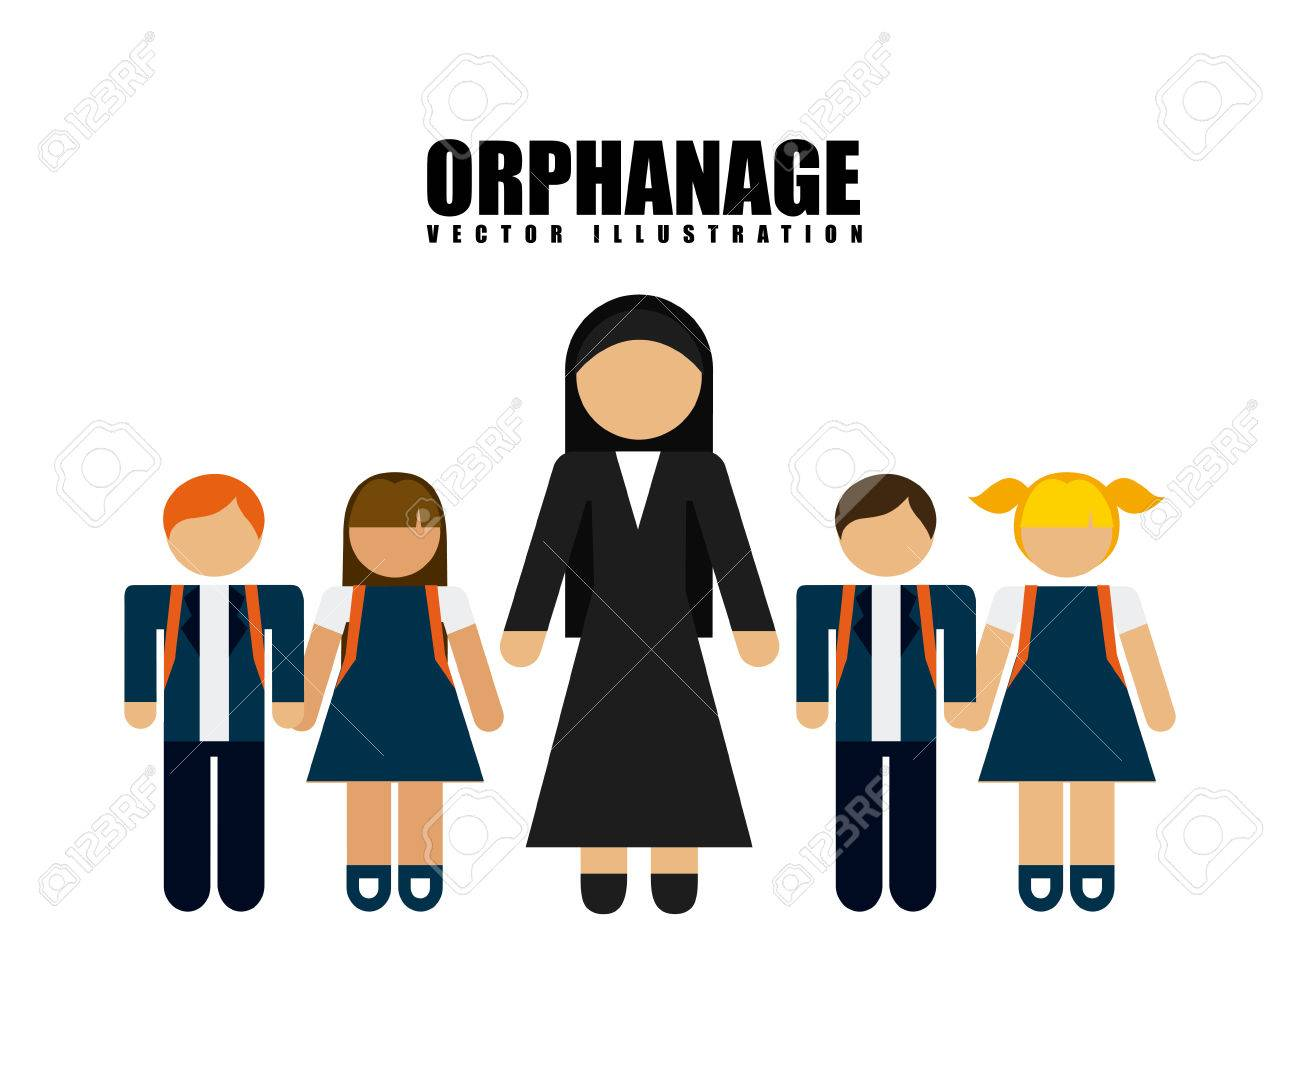 orphanage concept design, vector illustration graphic.